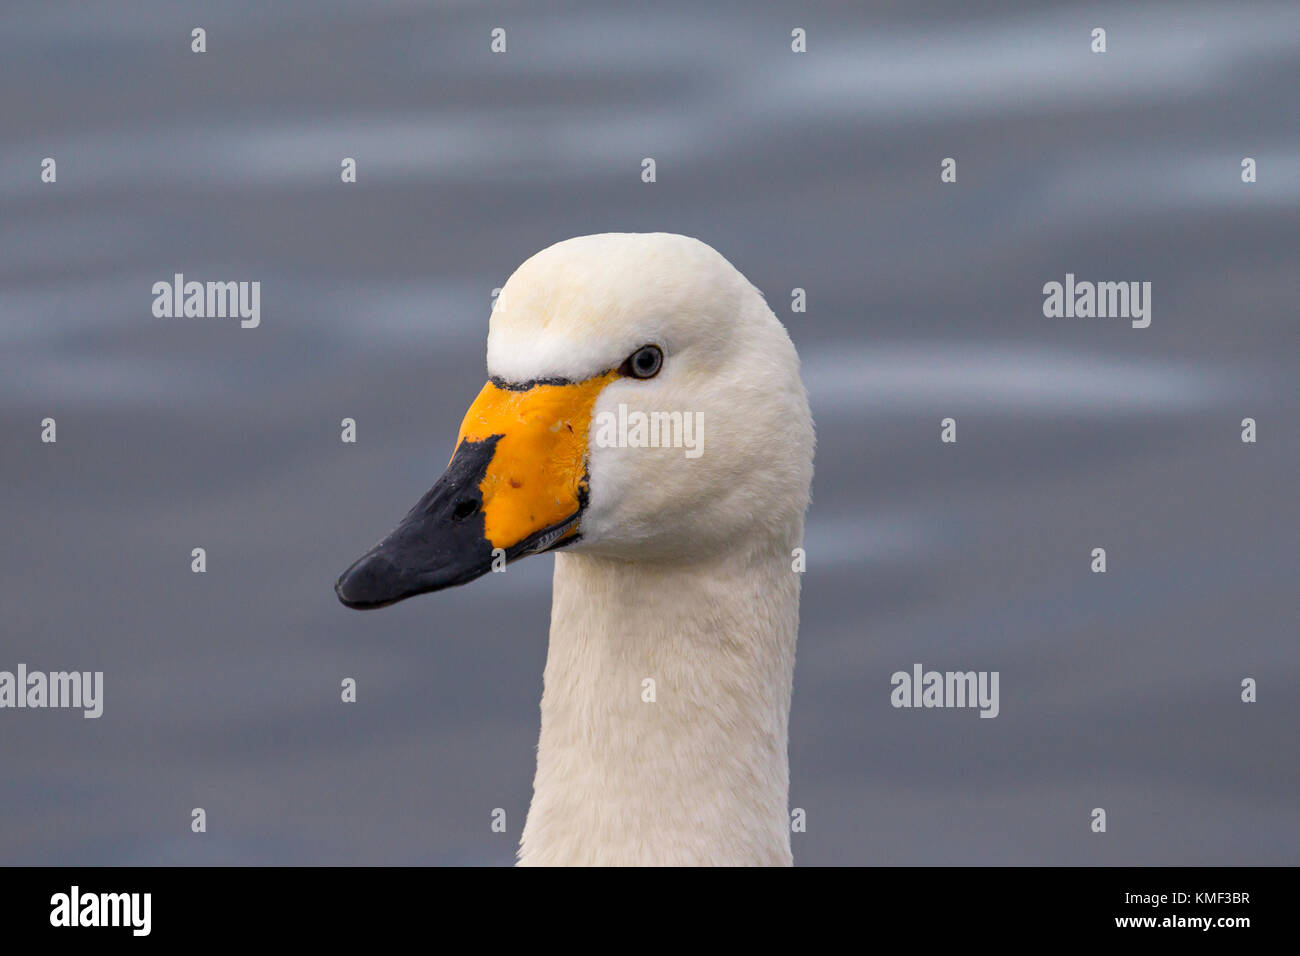 Portrait de cygne chanteur (Cygnus cygnus) Nager en hiver Photo Stock